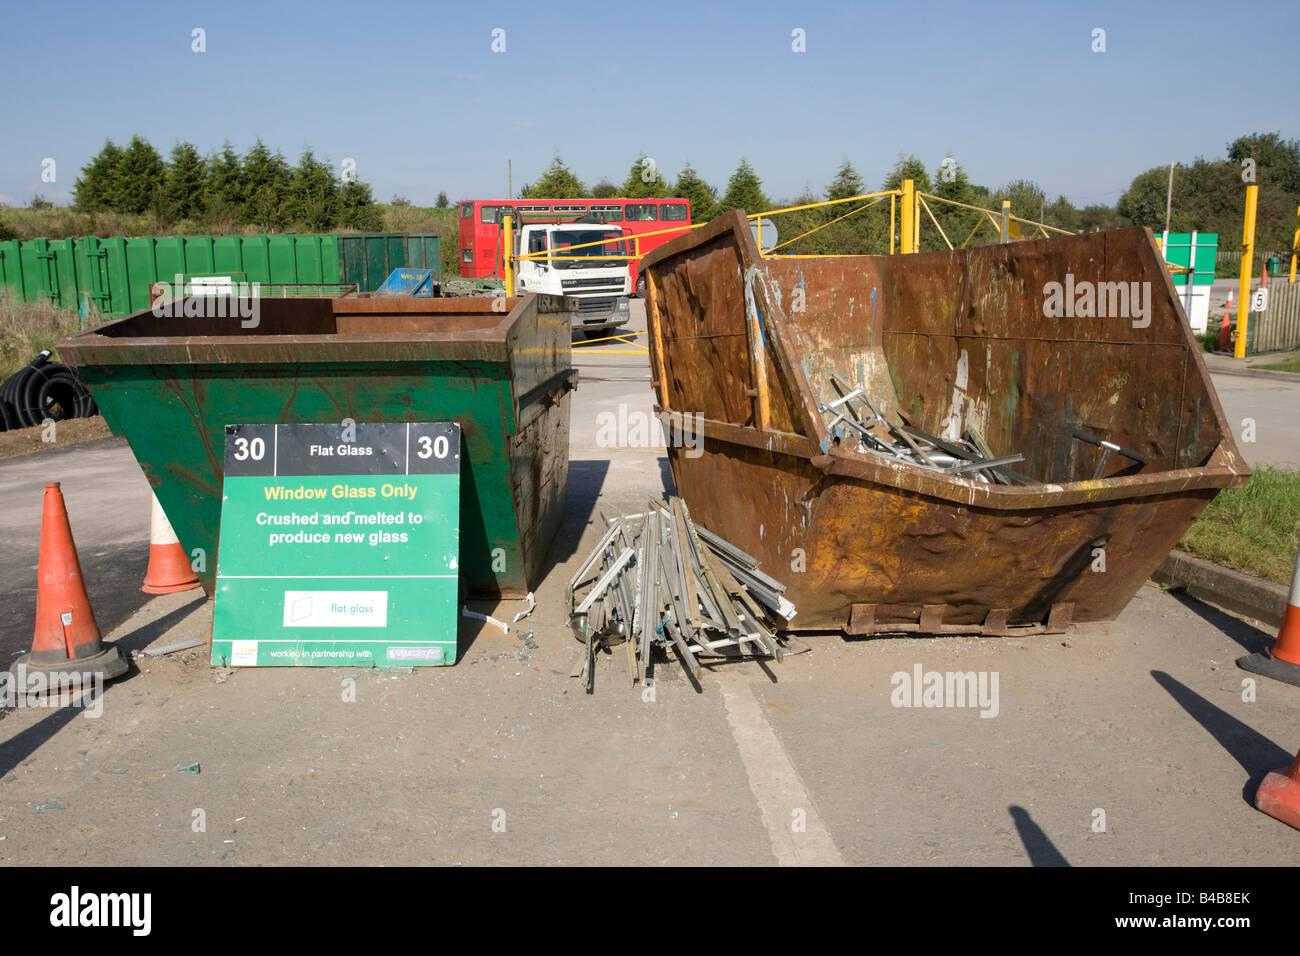 Window glass recycling skip domestic site Wingmoor Farm Stoke Orchard Cheltenham UK - Stock Image